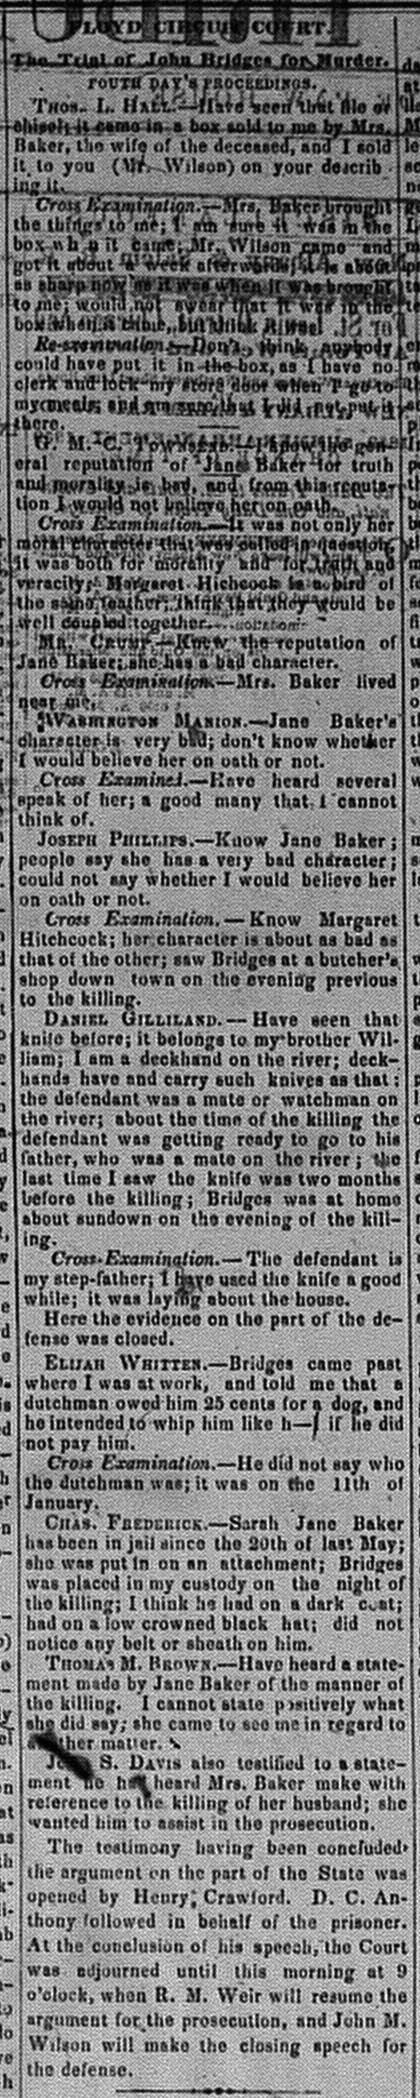 New Albany Daily Tribune, Saturday, 5 November 1859, p.2, column 2, Stuart Barth Wrege Indiana History Room